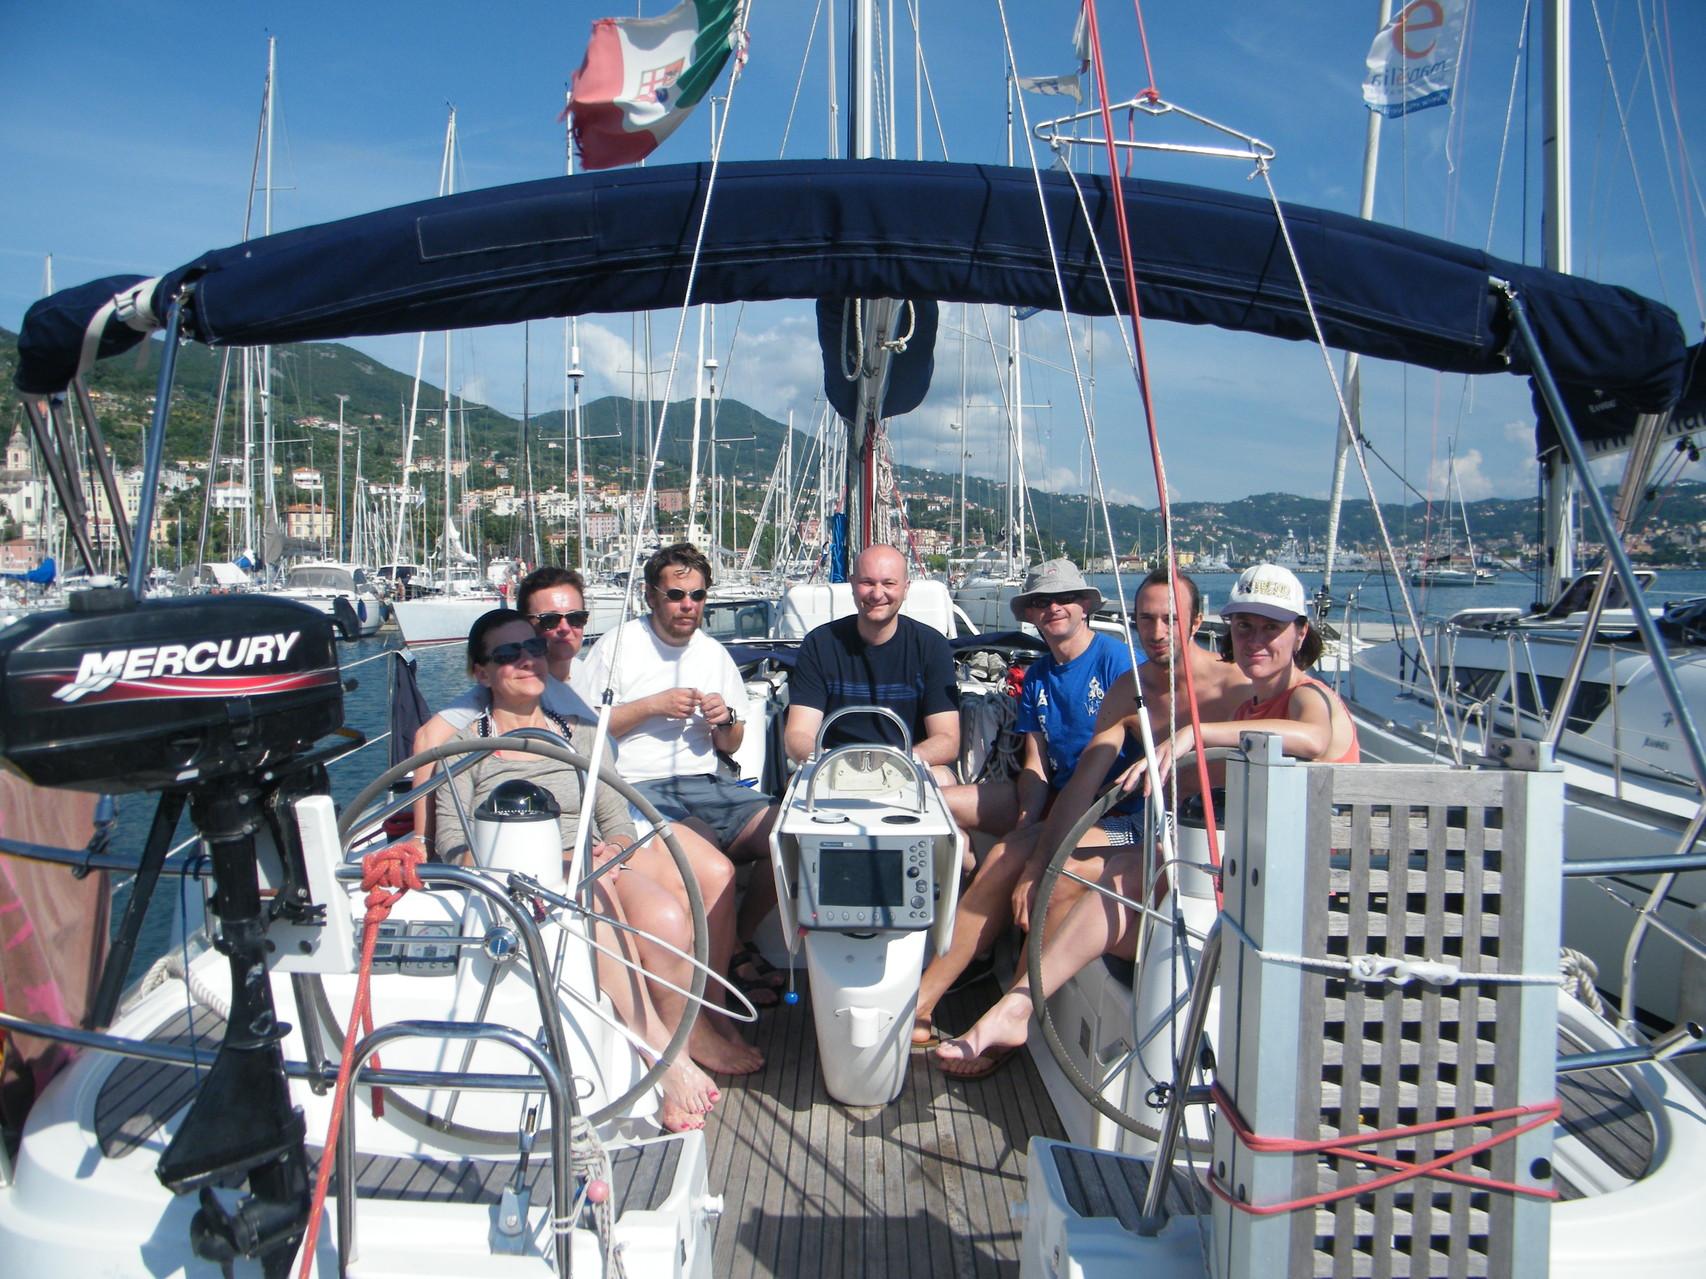 vacanze in barca a vela Cinque Terre Liguria